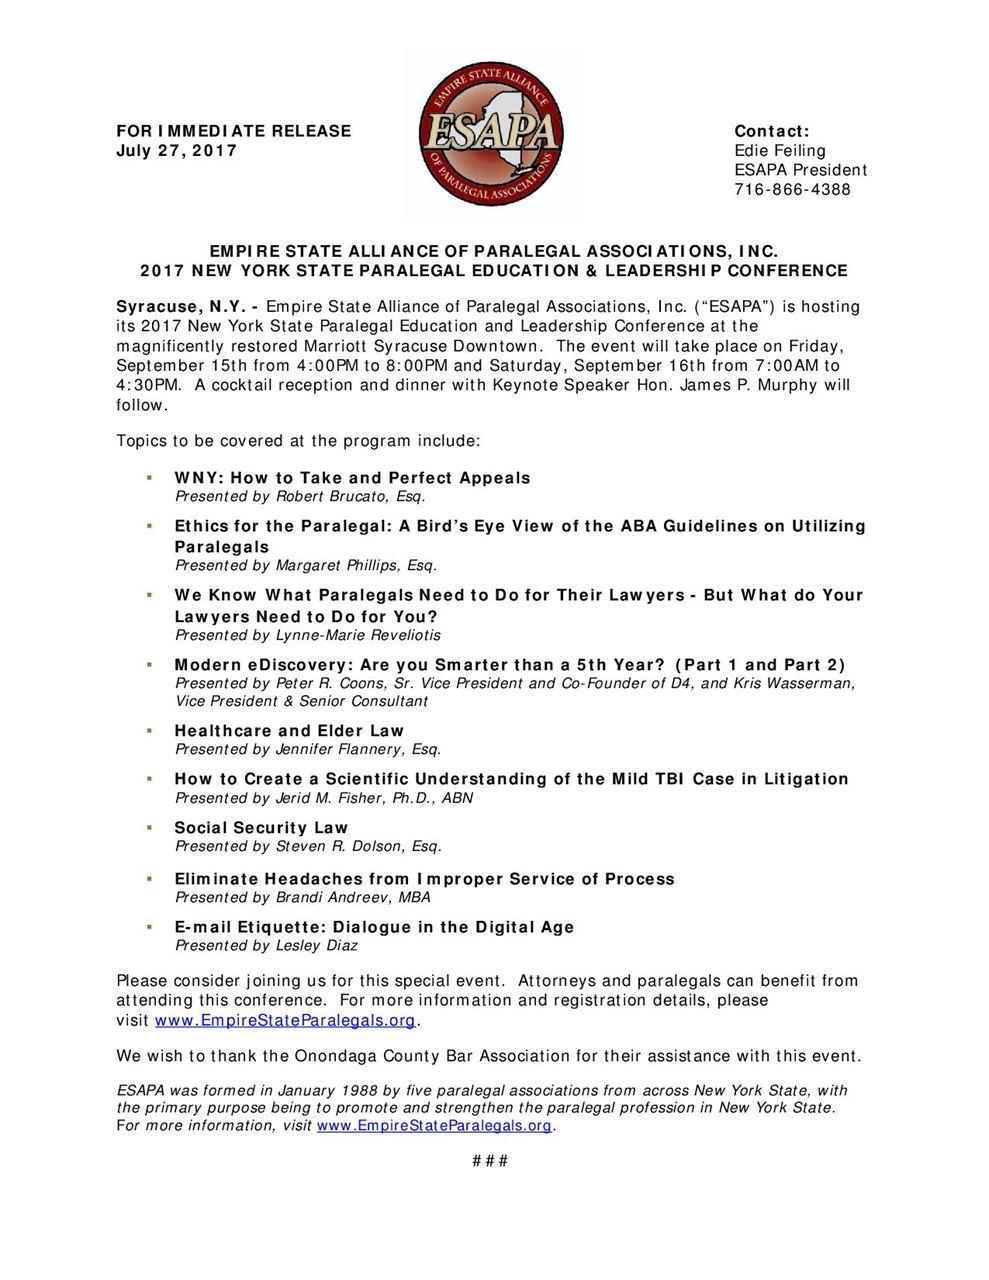 New York City Paralegal Association Esapa 2017 New York State